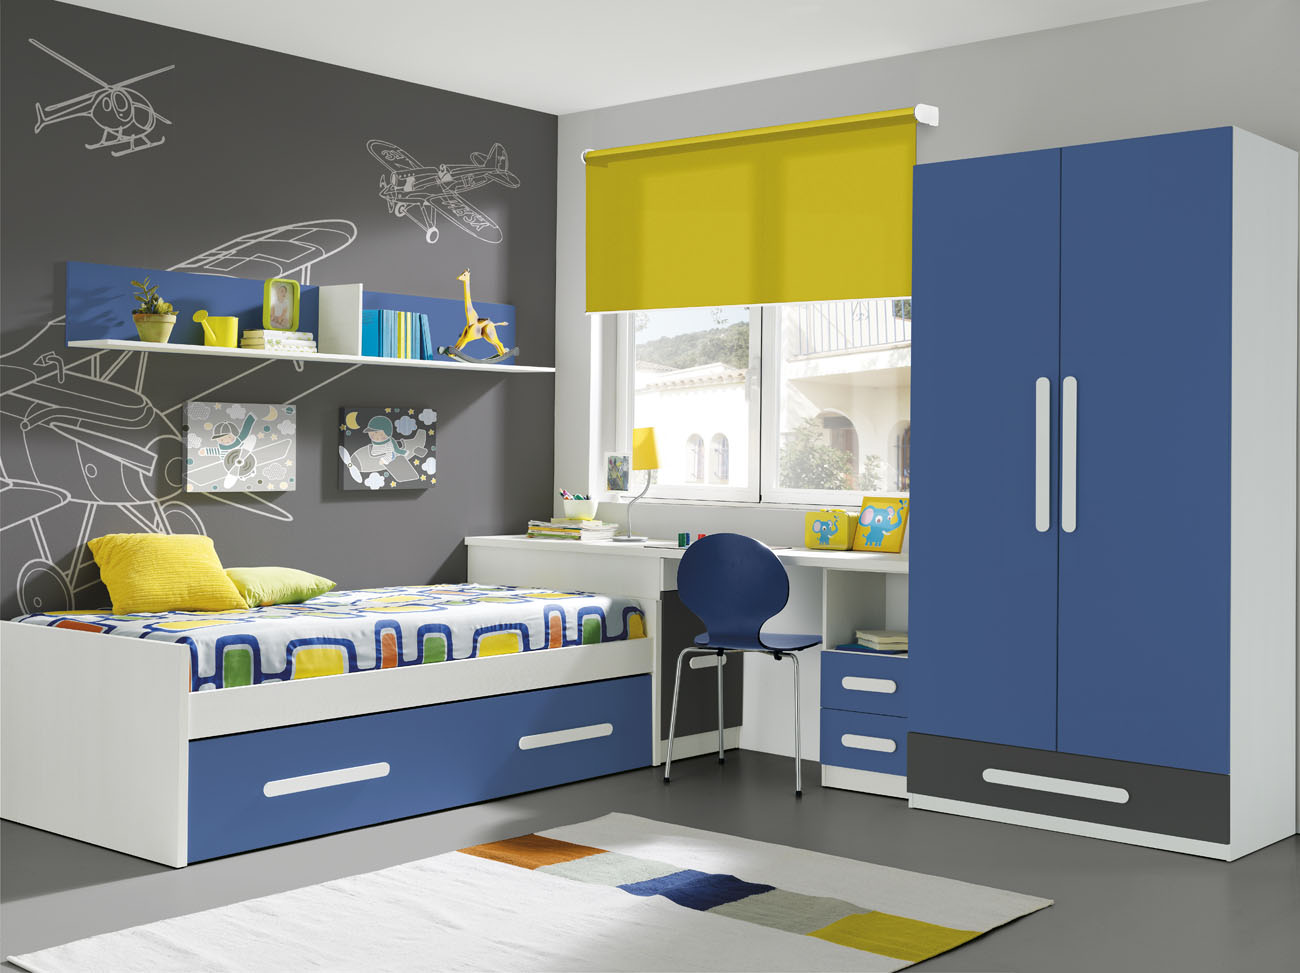 Dormitorio juvenil cama nido - Como pintar dormitorio juvenil ...